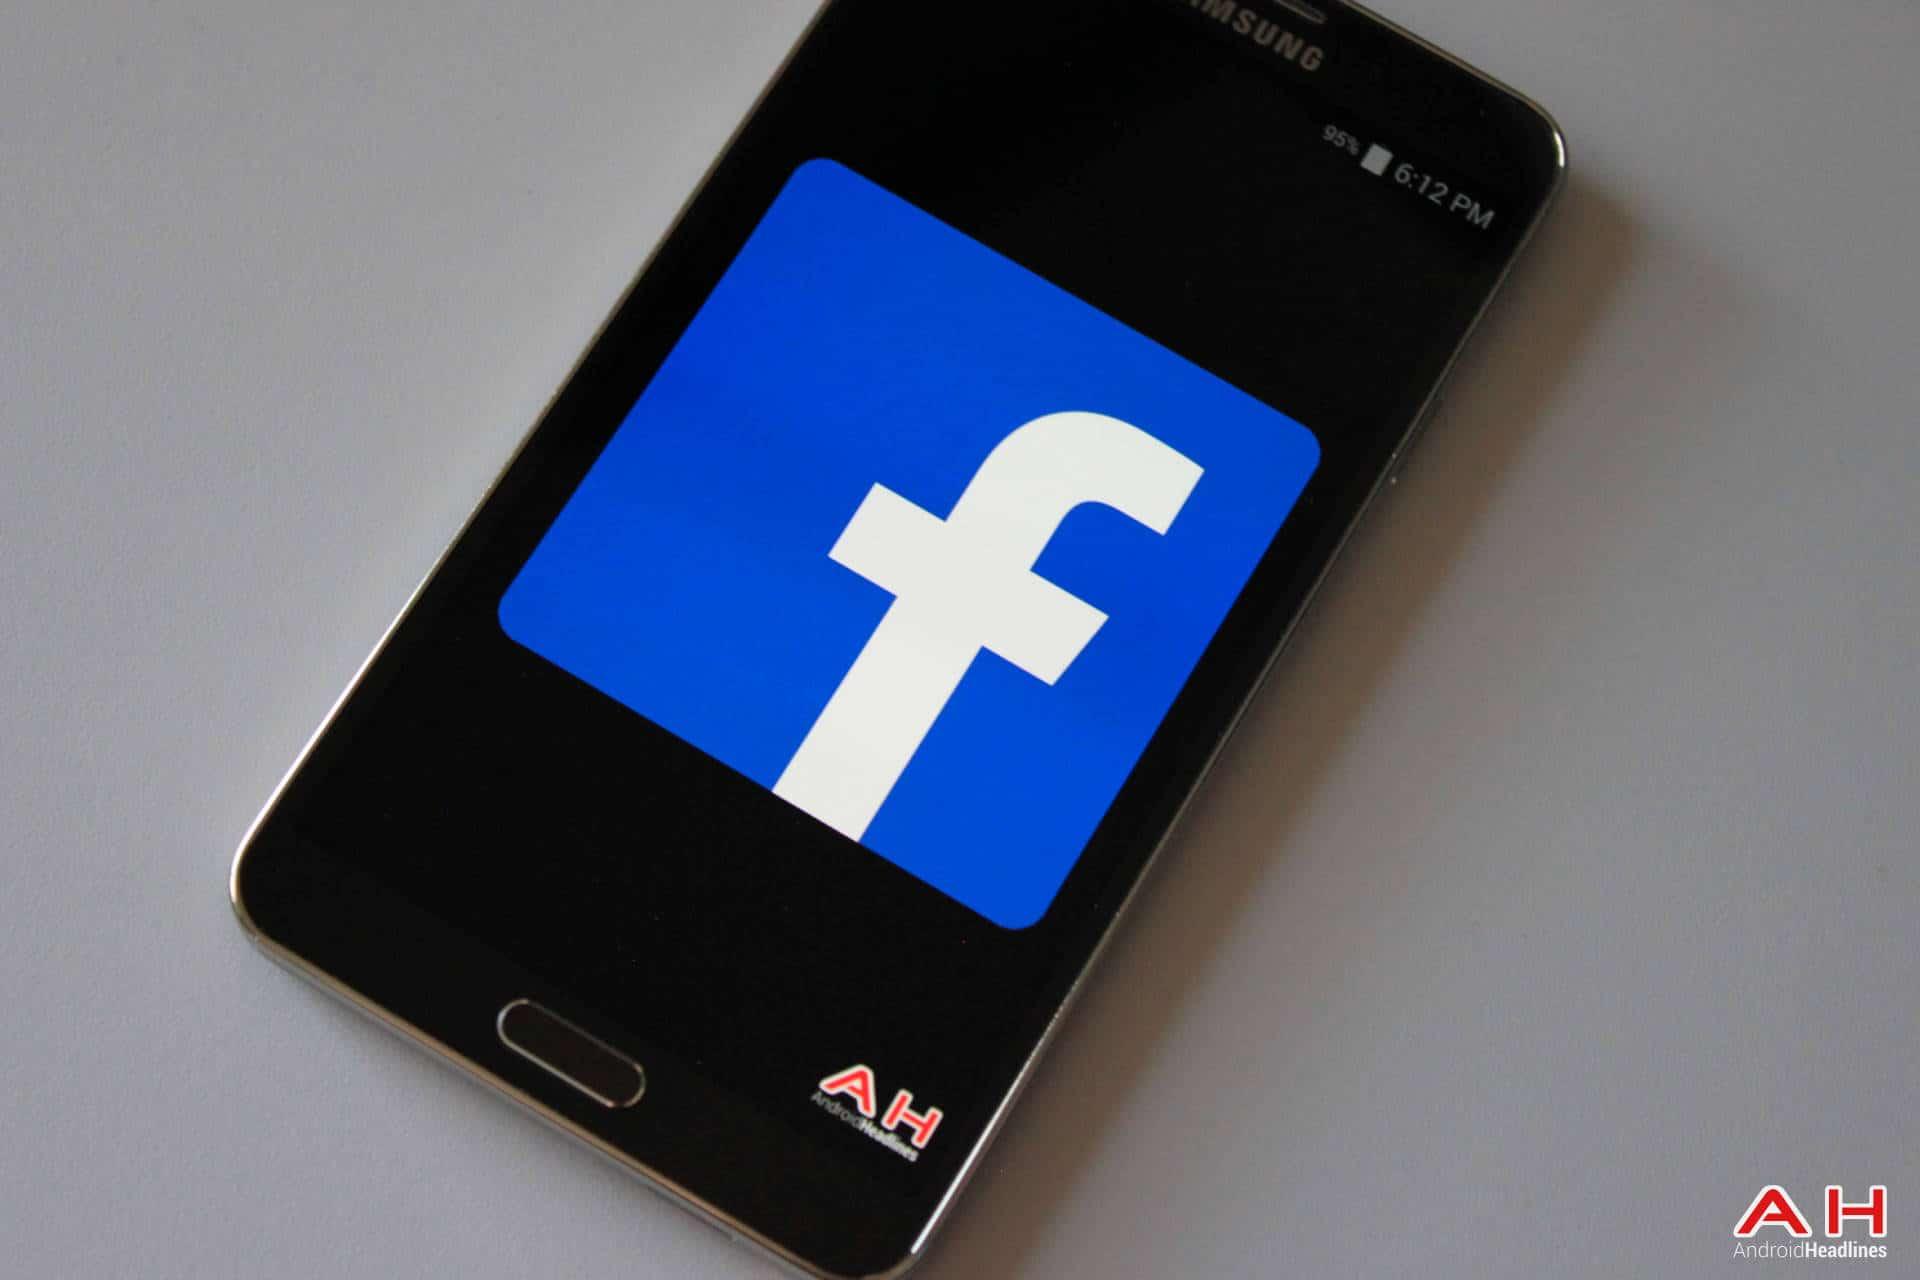 AH Facebook logo 1.3